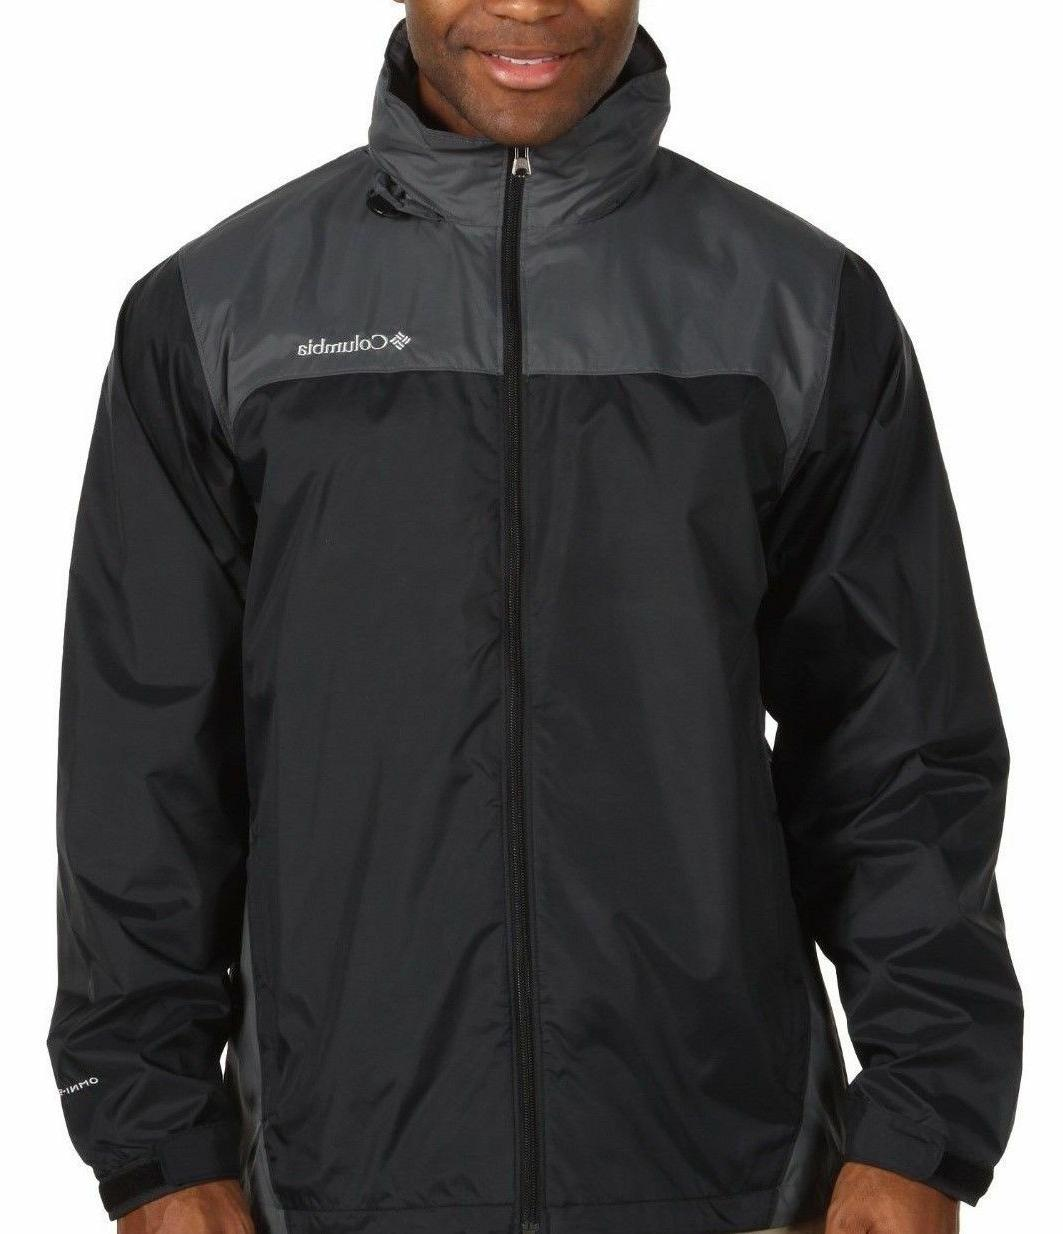 2017 Columbia Men's Glennaker Lakes Rain Jacket 1442361 All